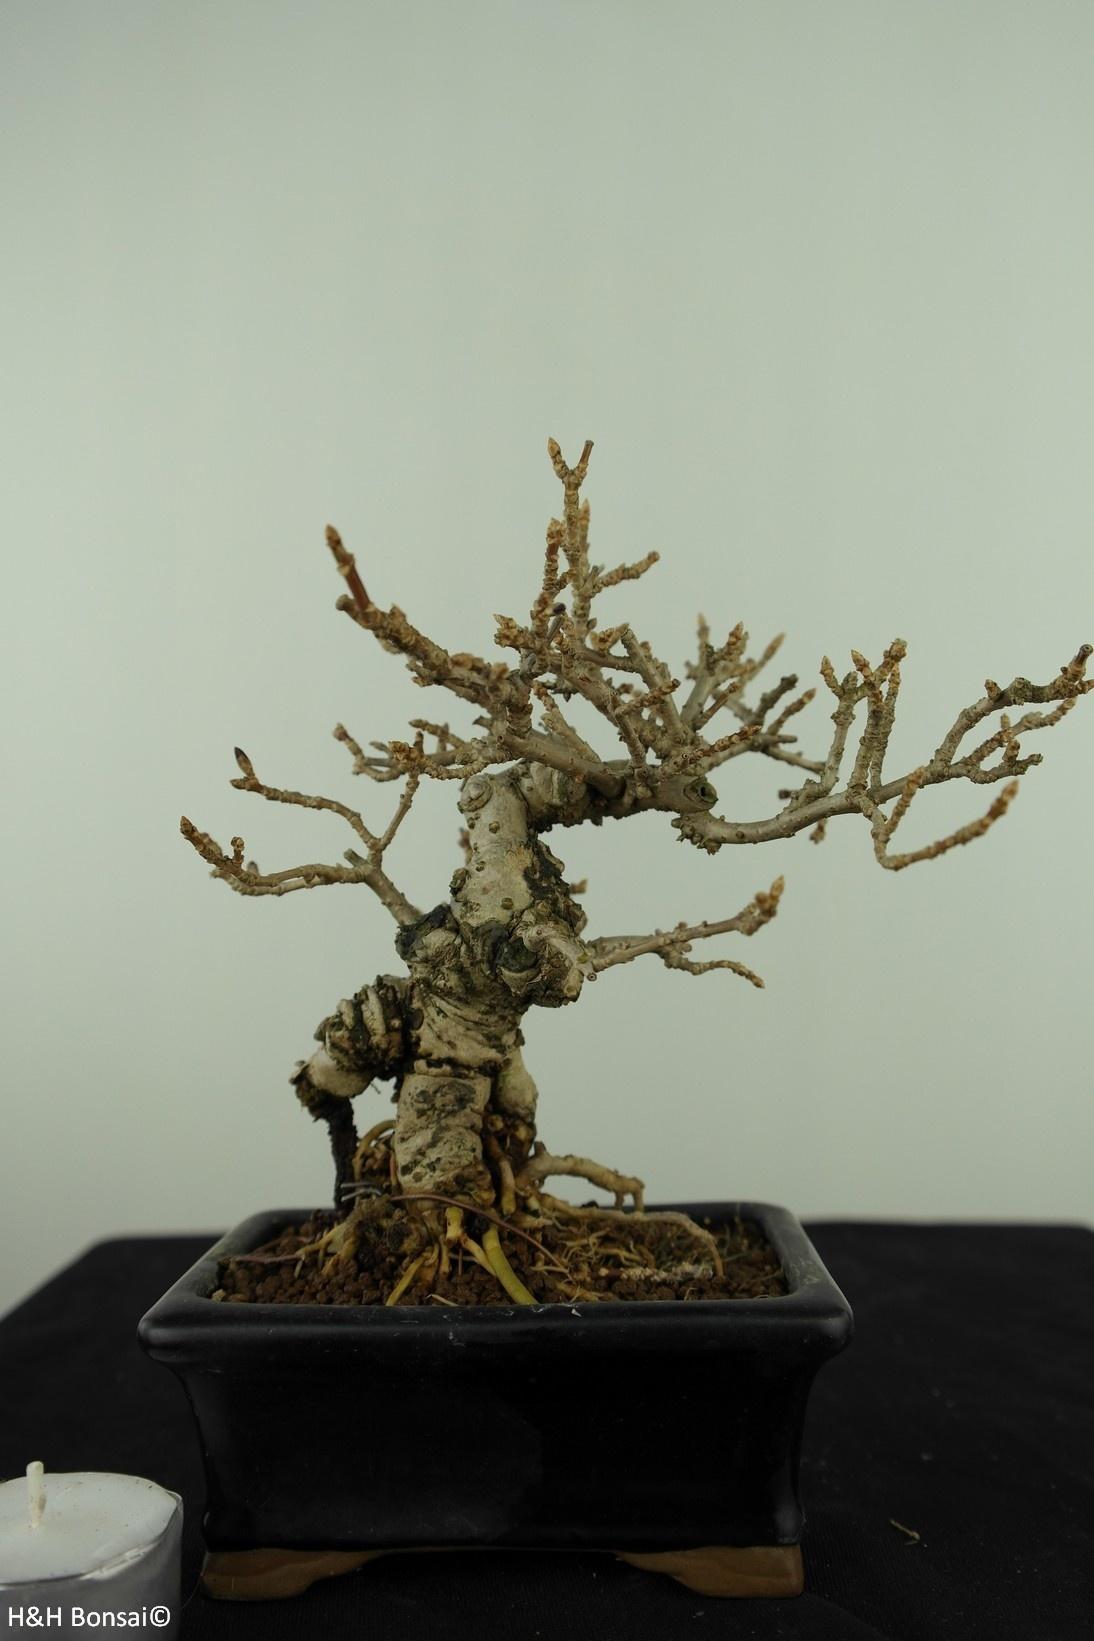 Bonsai Shohin Forsizia, Forsythia, no. 7517